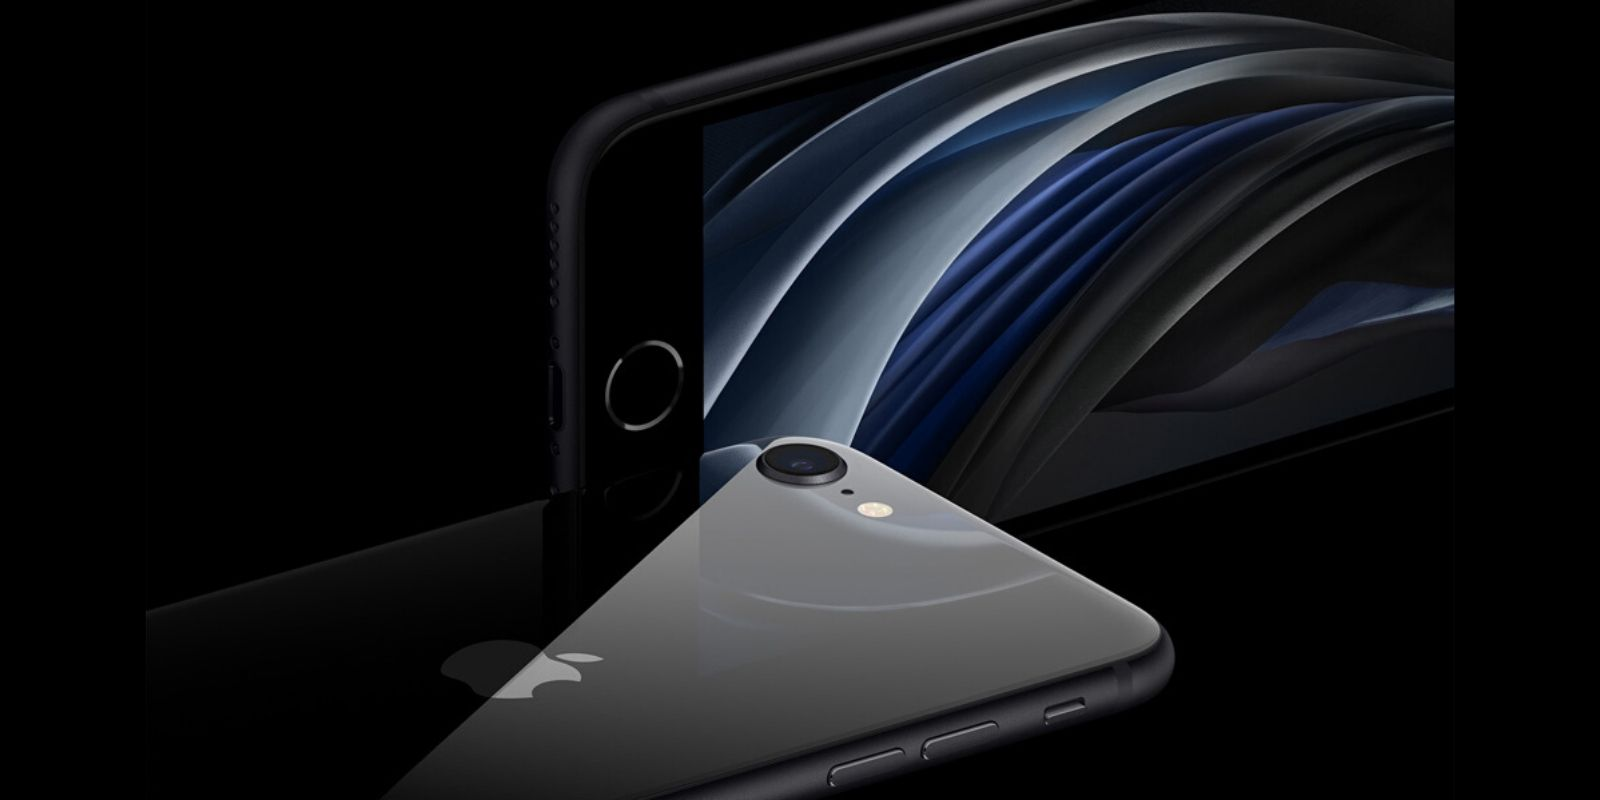 iPhone SE Black color